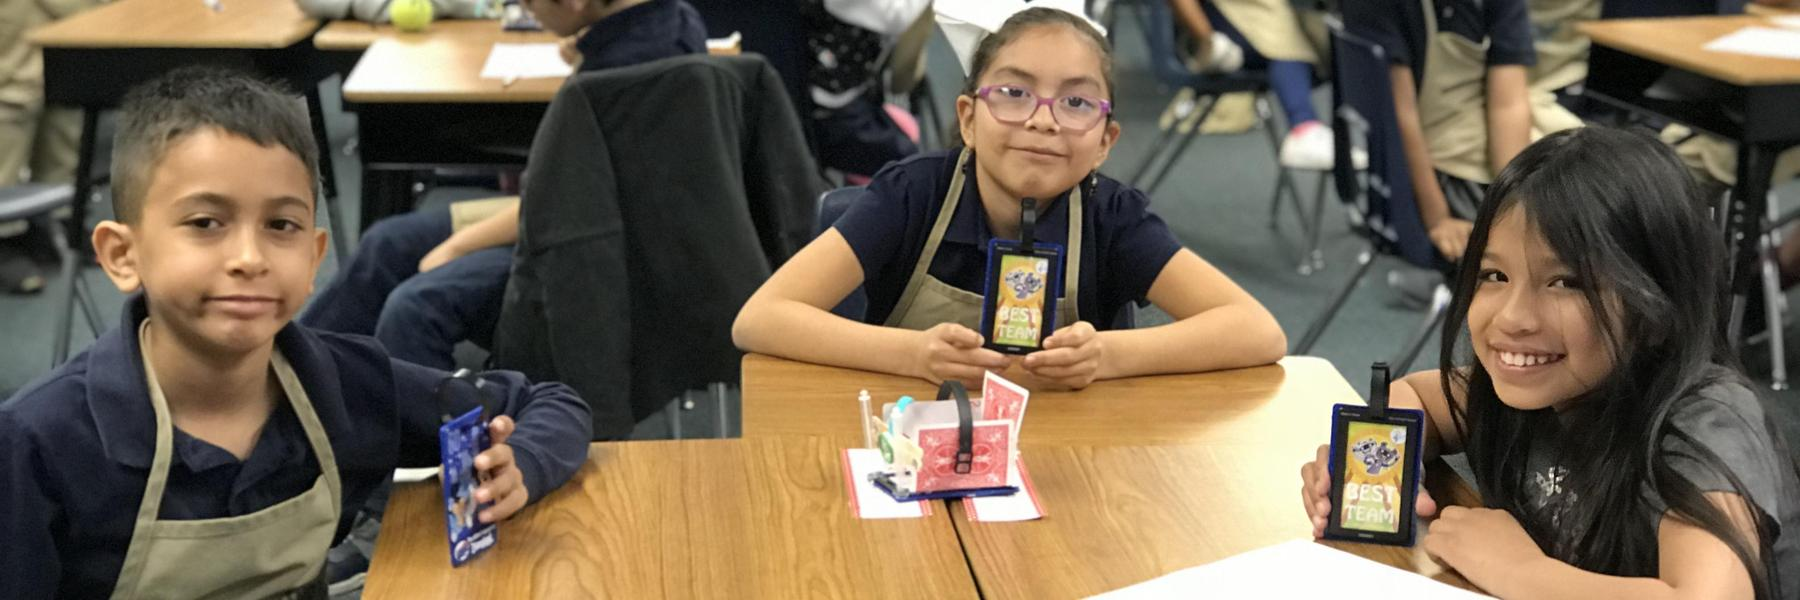 Child Creativity Labs STEM Workshop